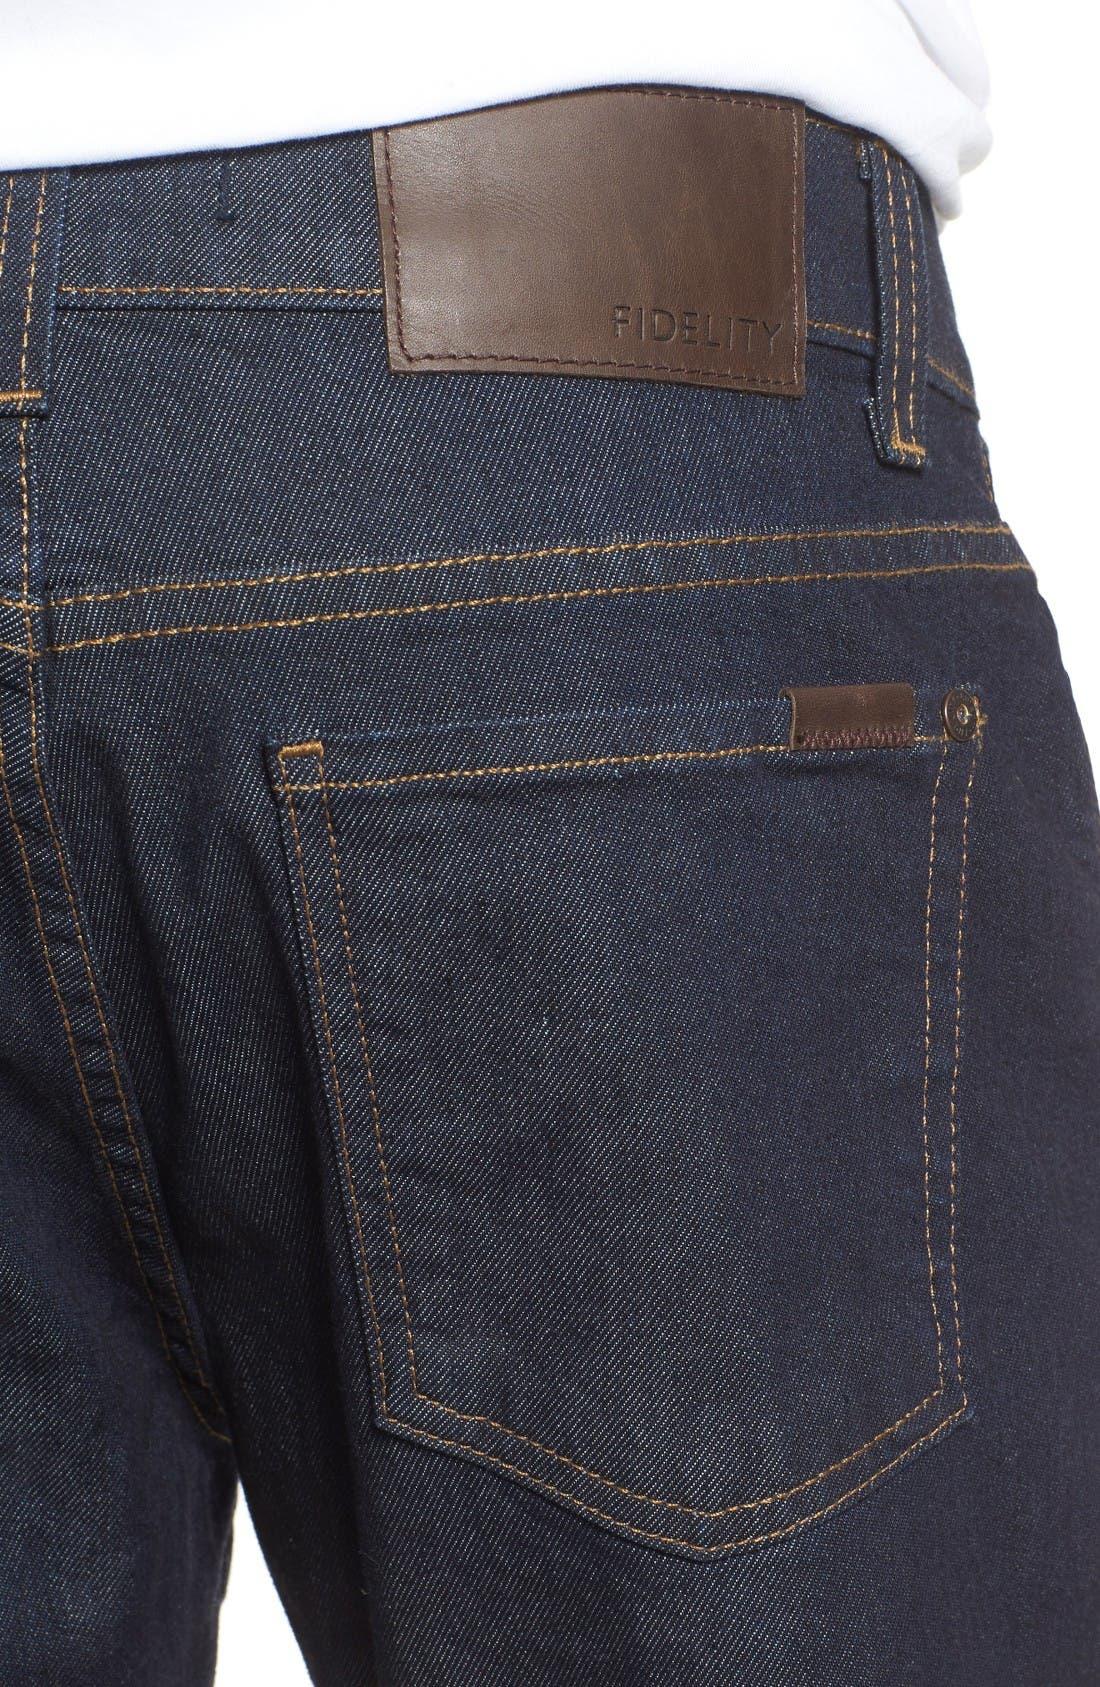 Alternate Image 4  - Fidelity Denim Jimmy Slim Straight Leg Jeans (Halo Rinse)